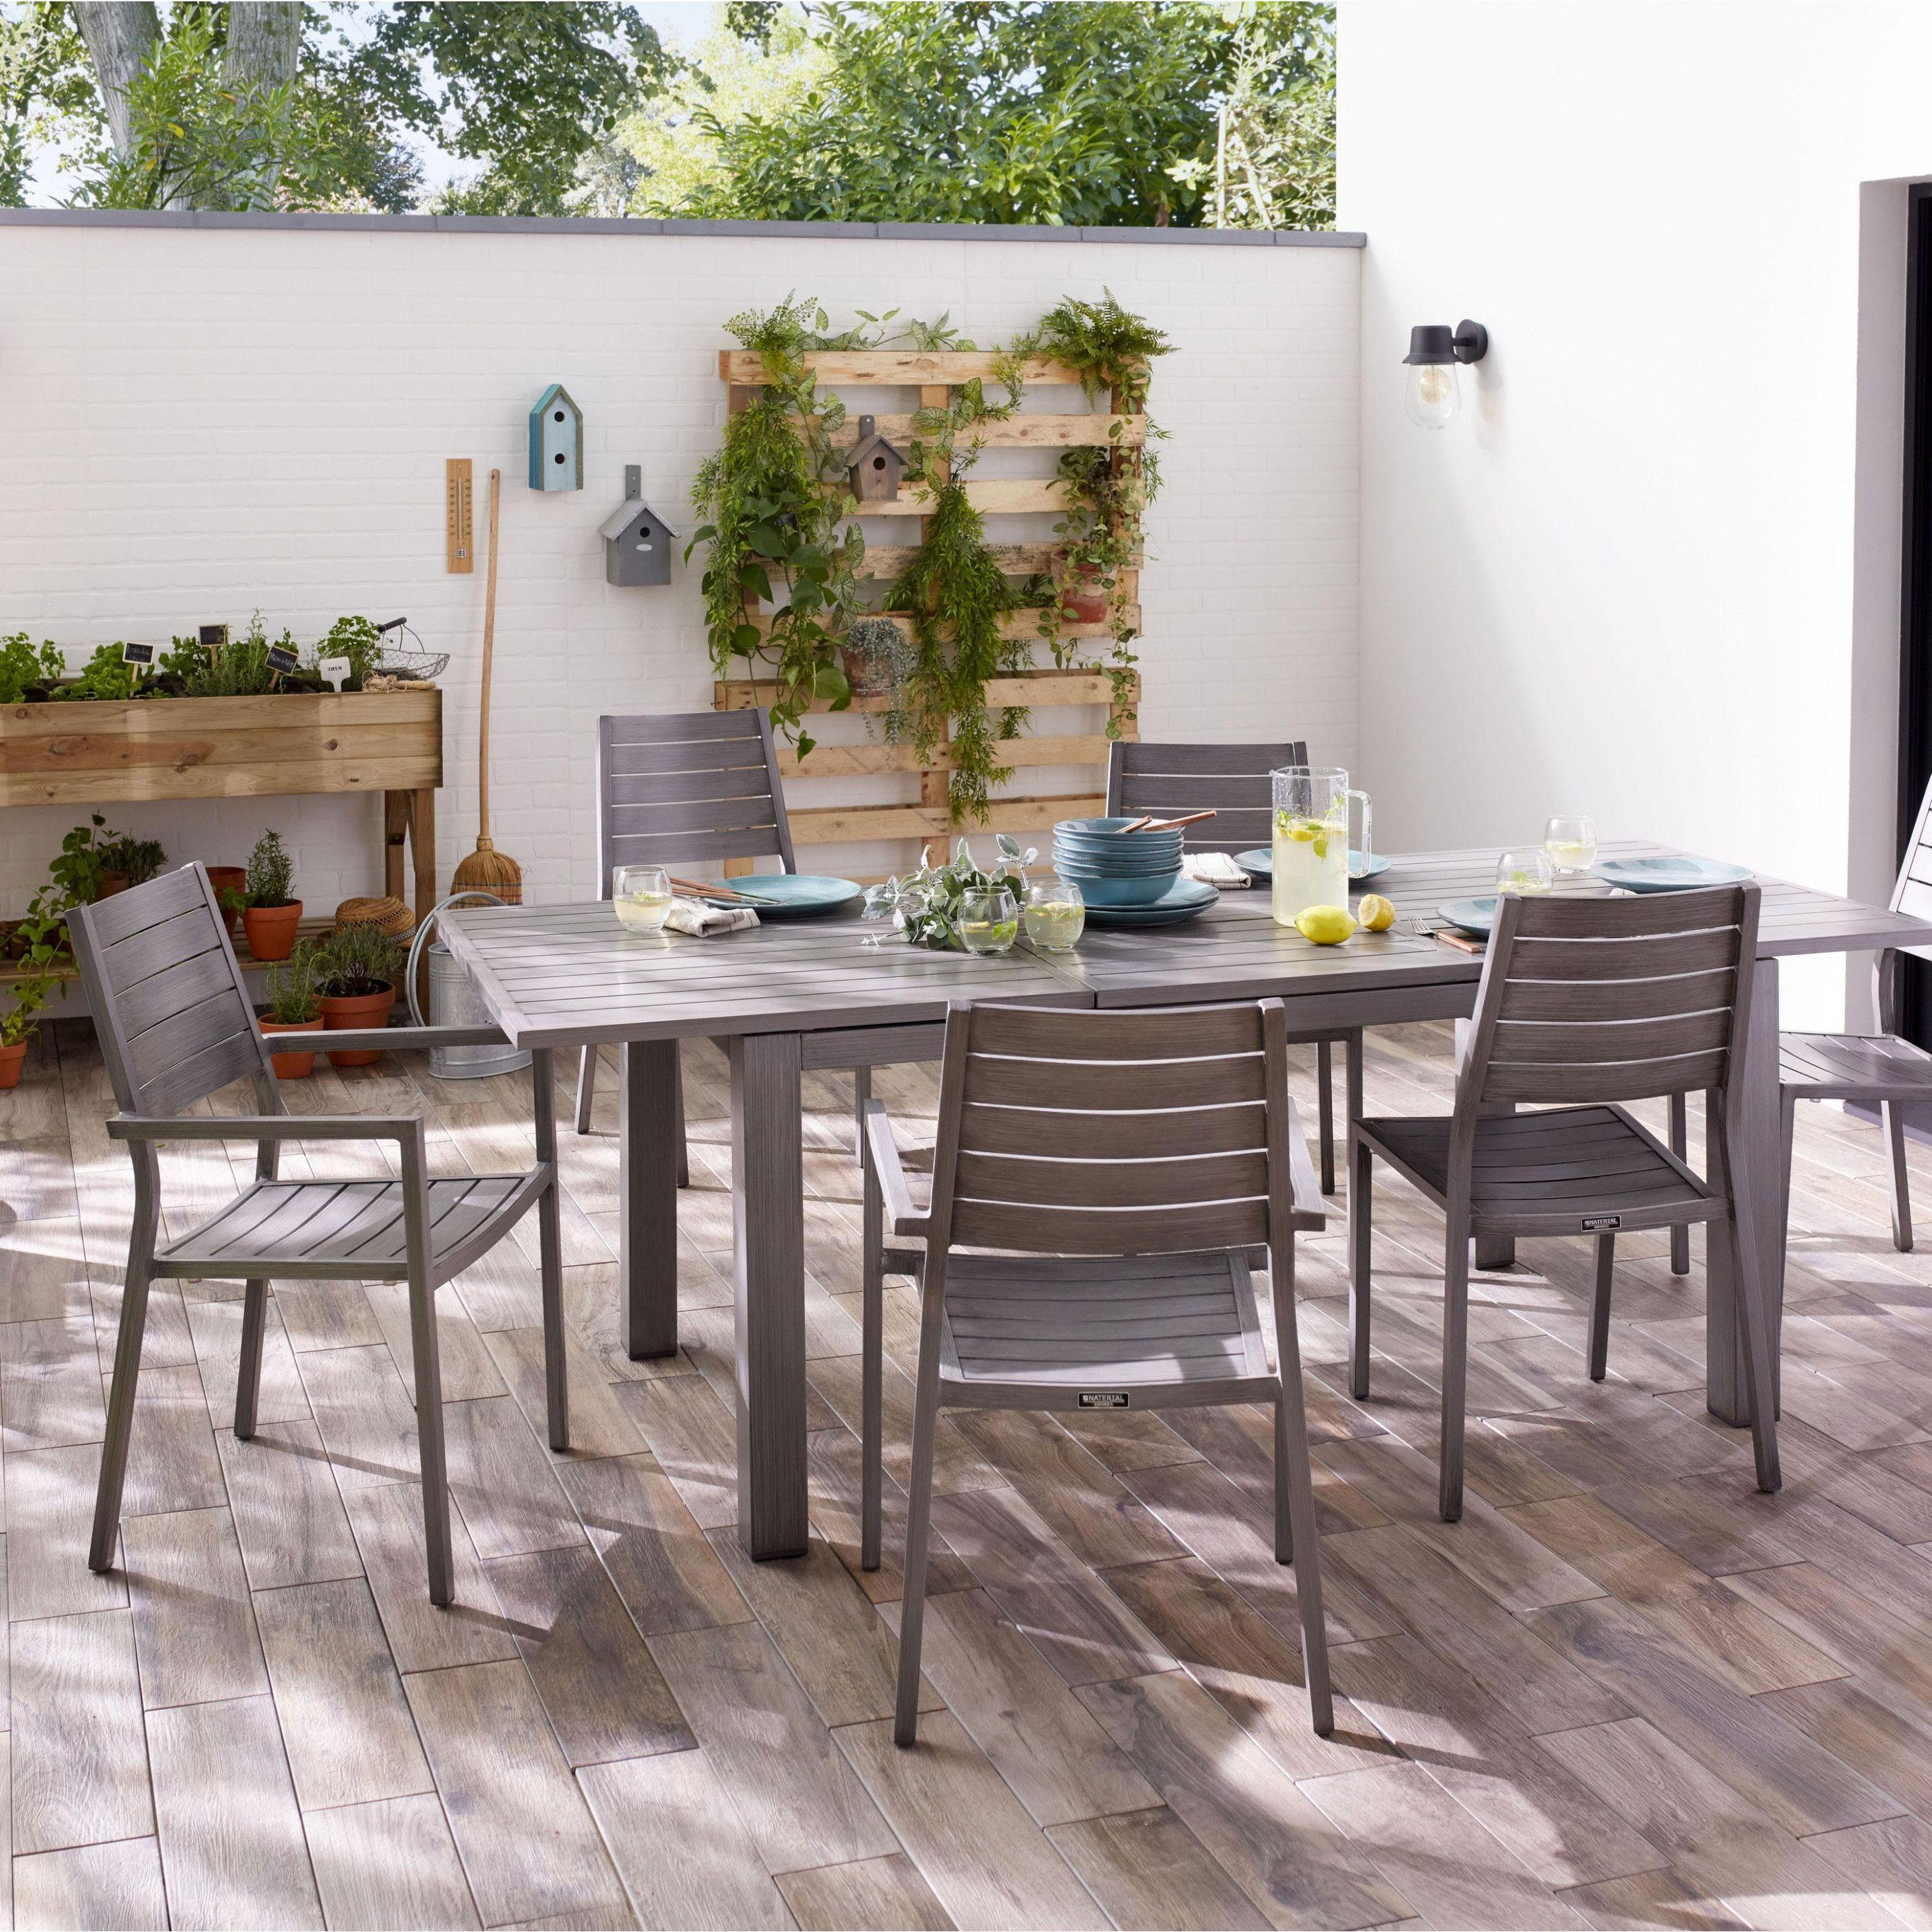 Salon De Jardin Qui Peut Rester Dehors In 2020 Outdoor Furniture Sets Outdoor Furniture Home